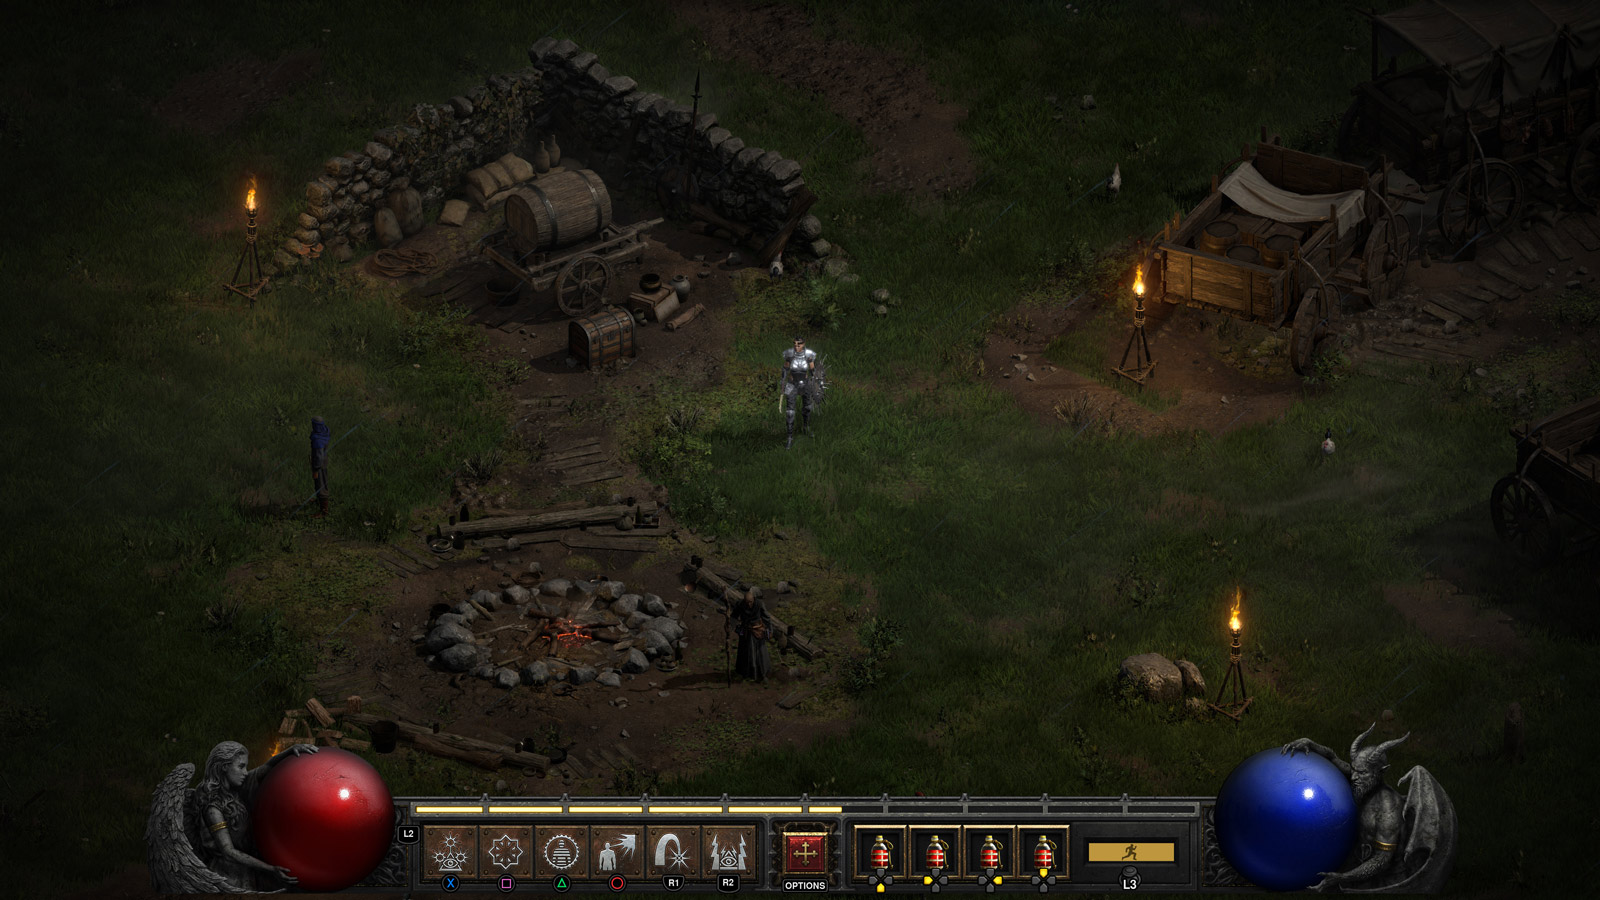 zrzut ekranu z gry Diablo II: Resurrected